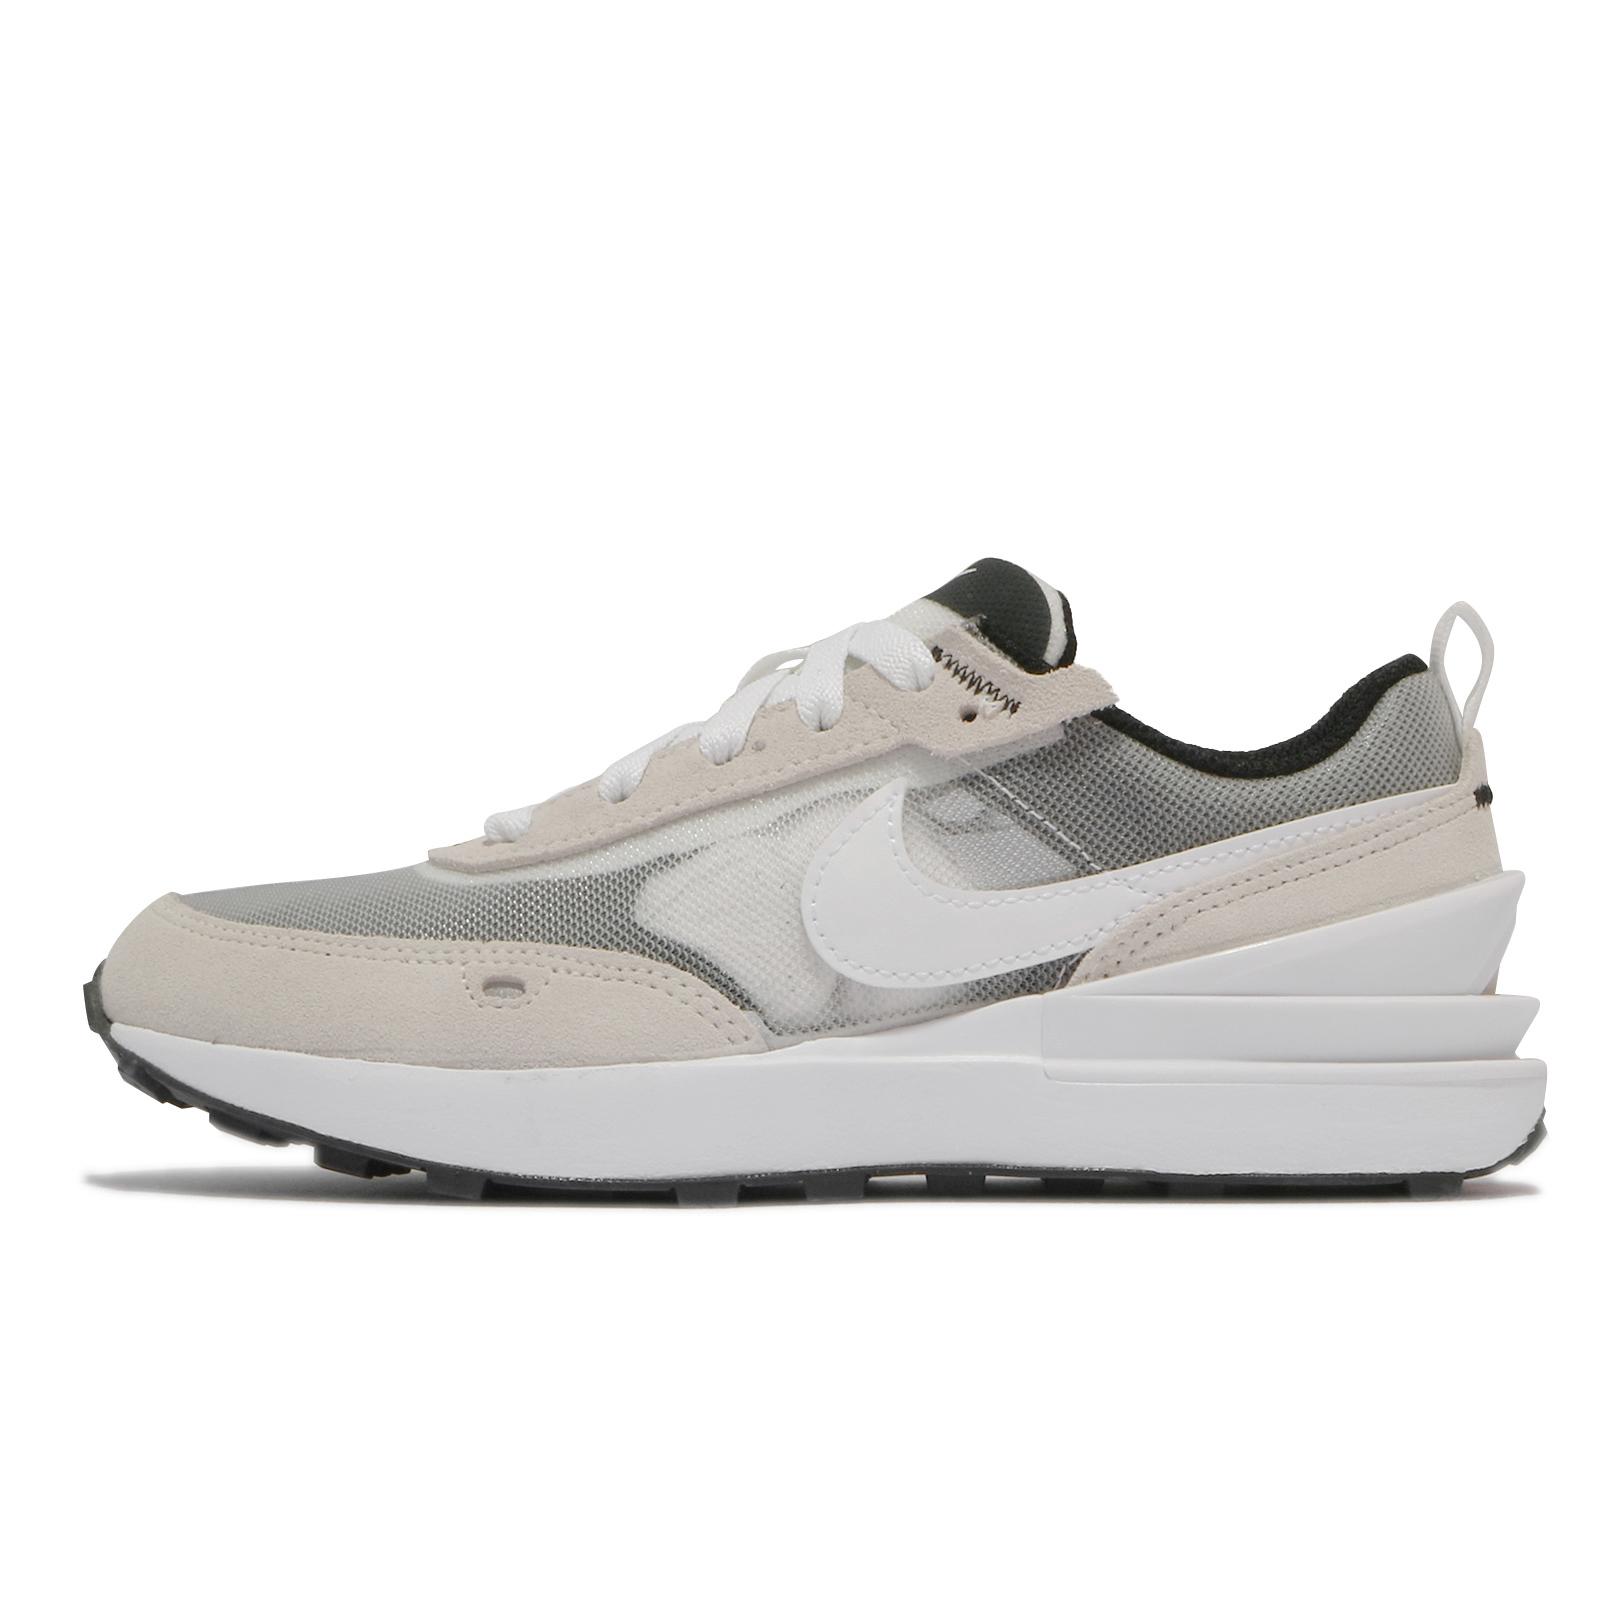 Nike 童鞋 Waffle One PS 灰 白 小Sacai 小朋友 運動鞋 半透明【ACS】 DC0480-100